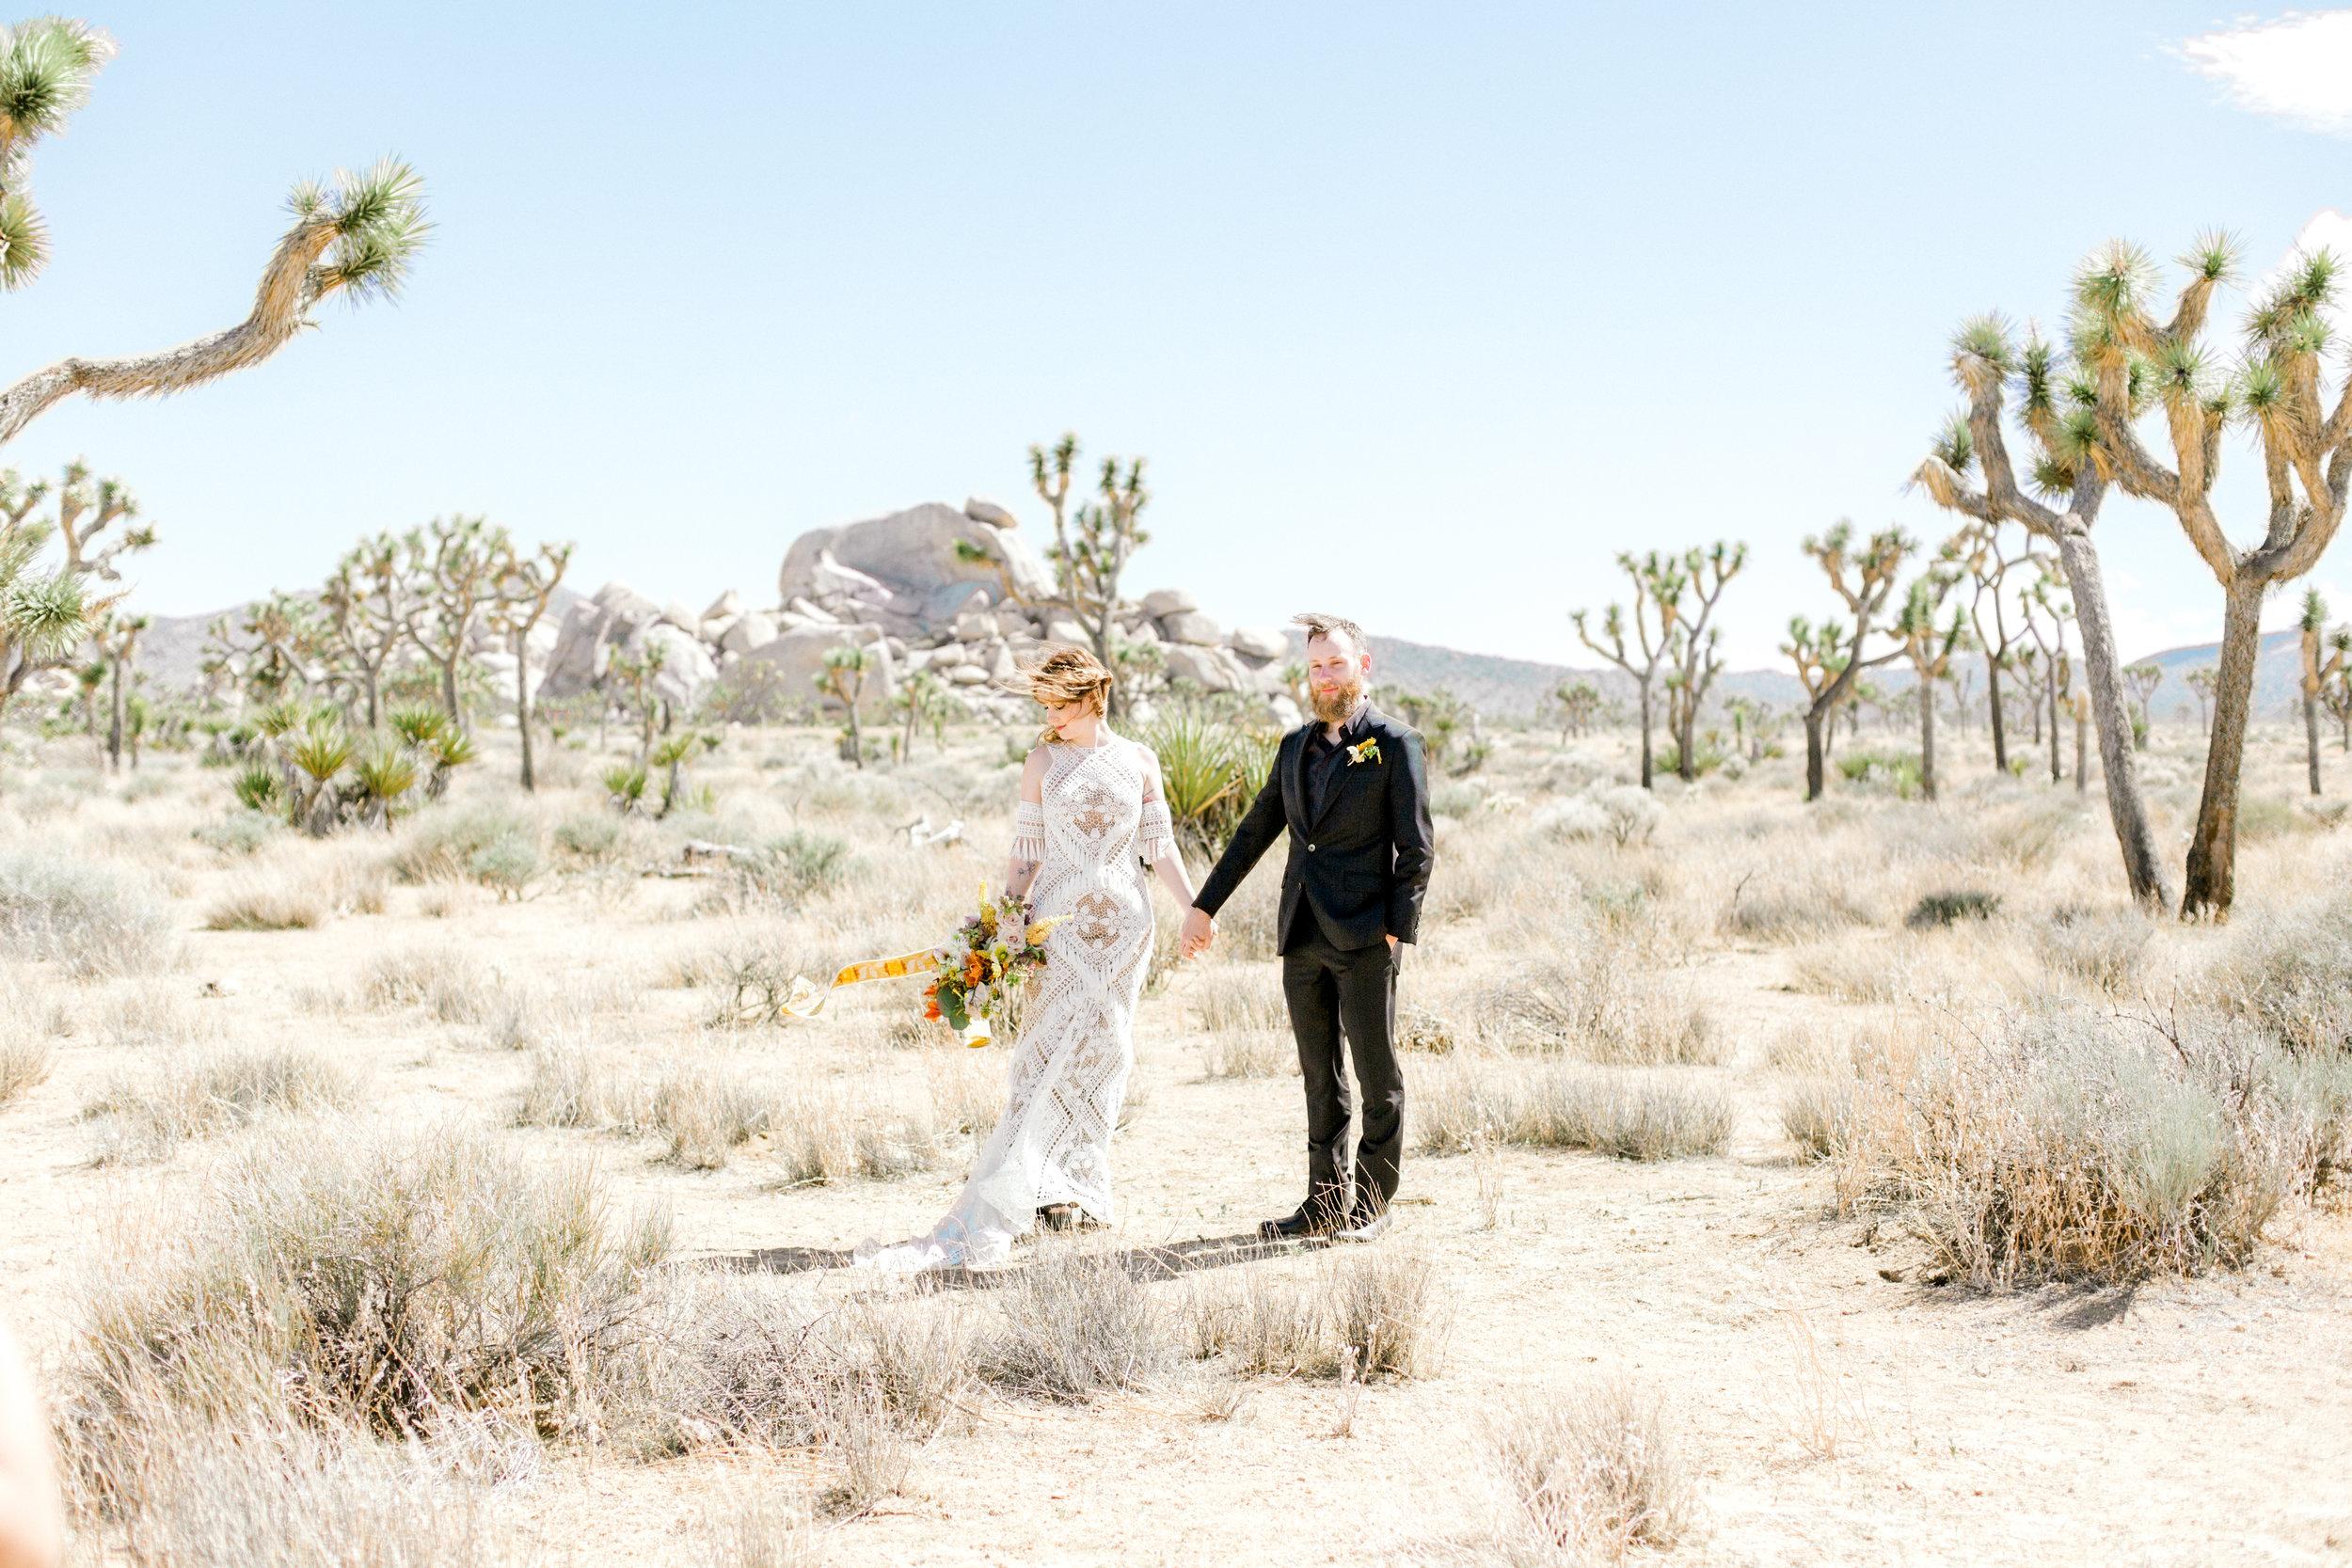 jessica sgubin photography atlanta portrait photographer engagement family couple wedding joshua tree wedding elopement-1-2.jpg